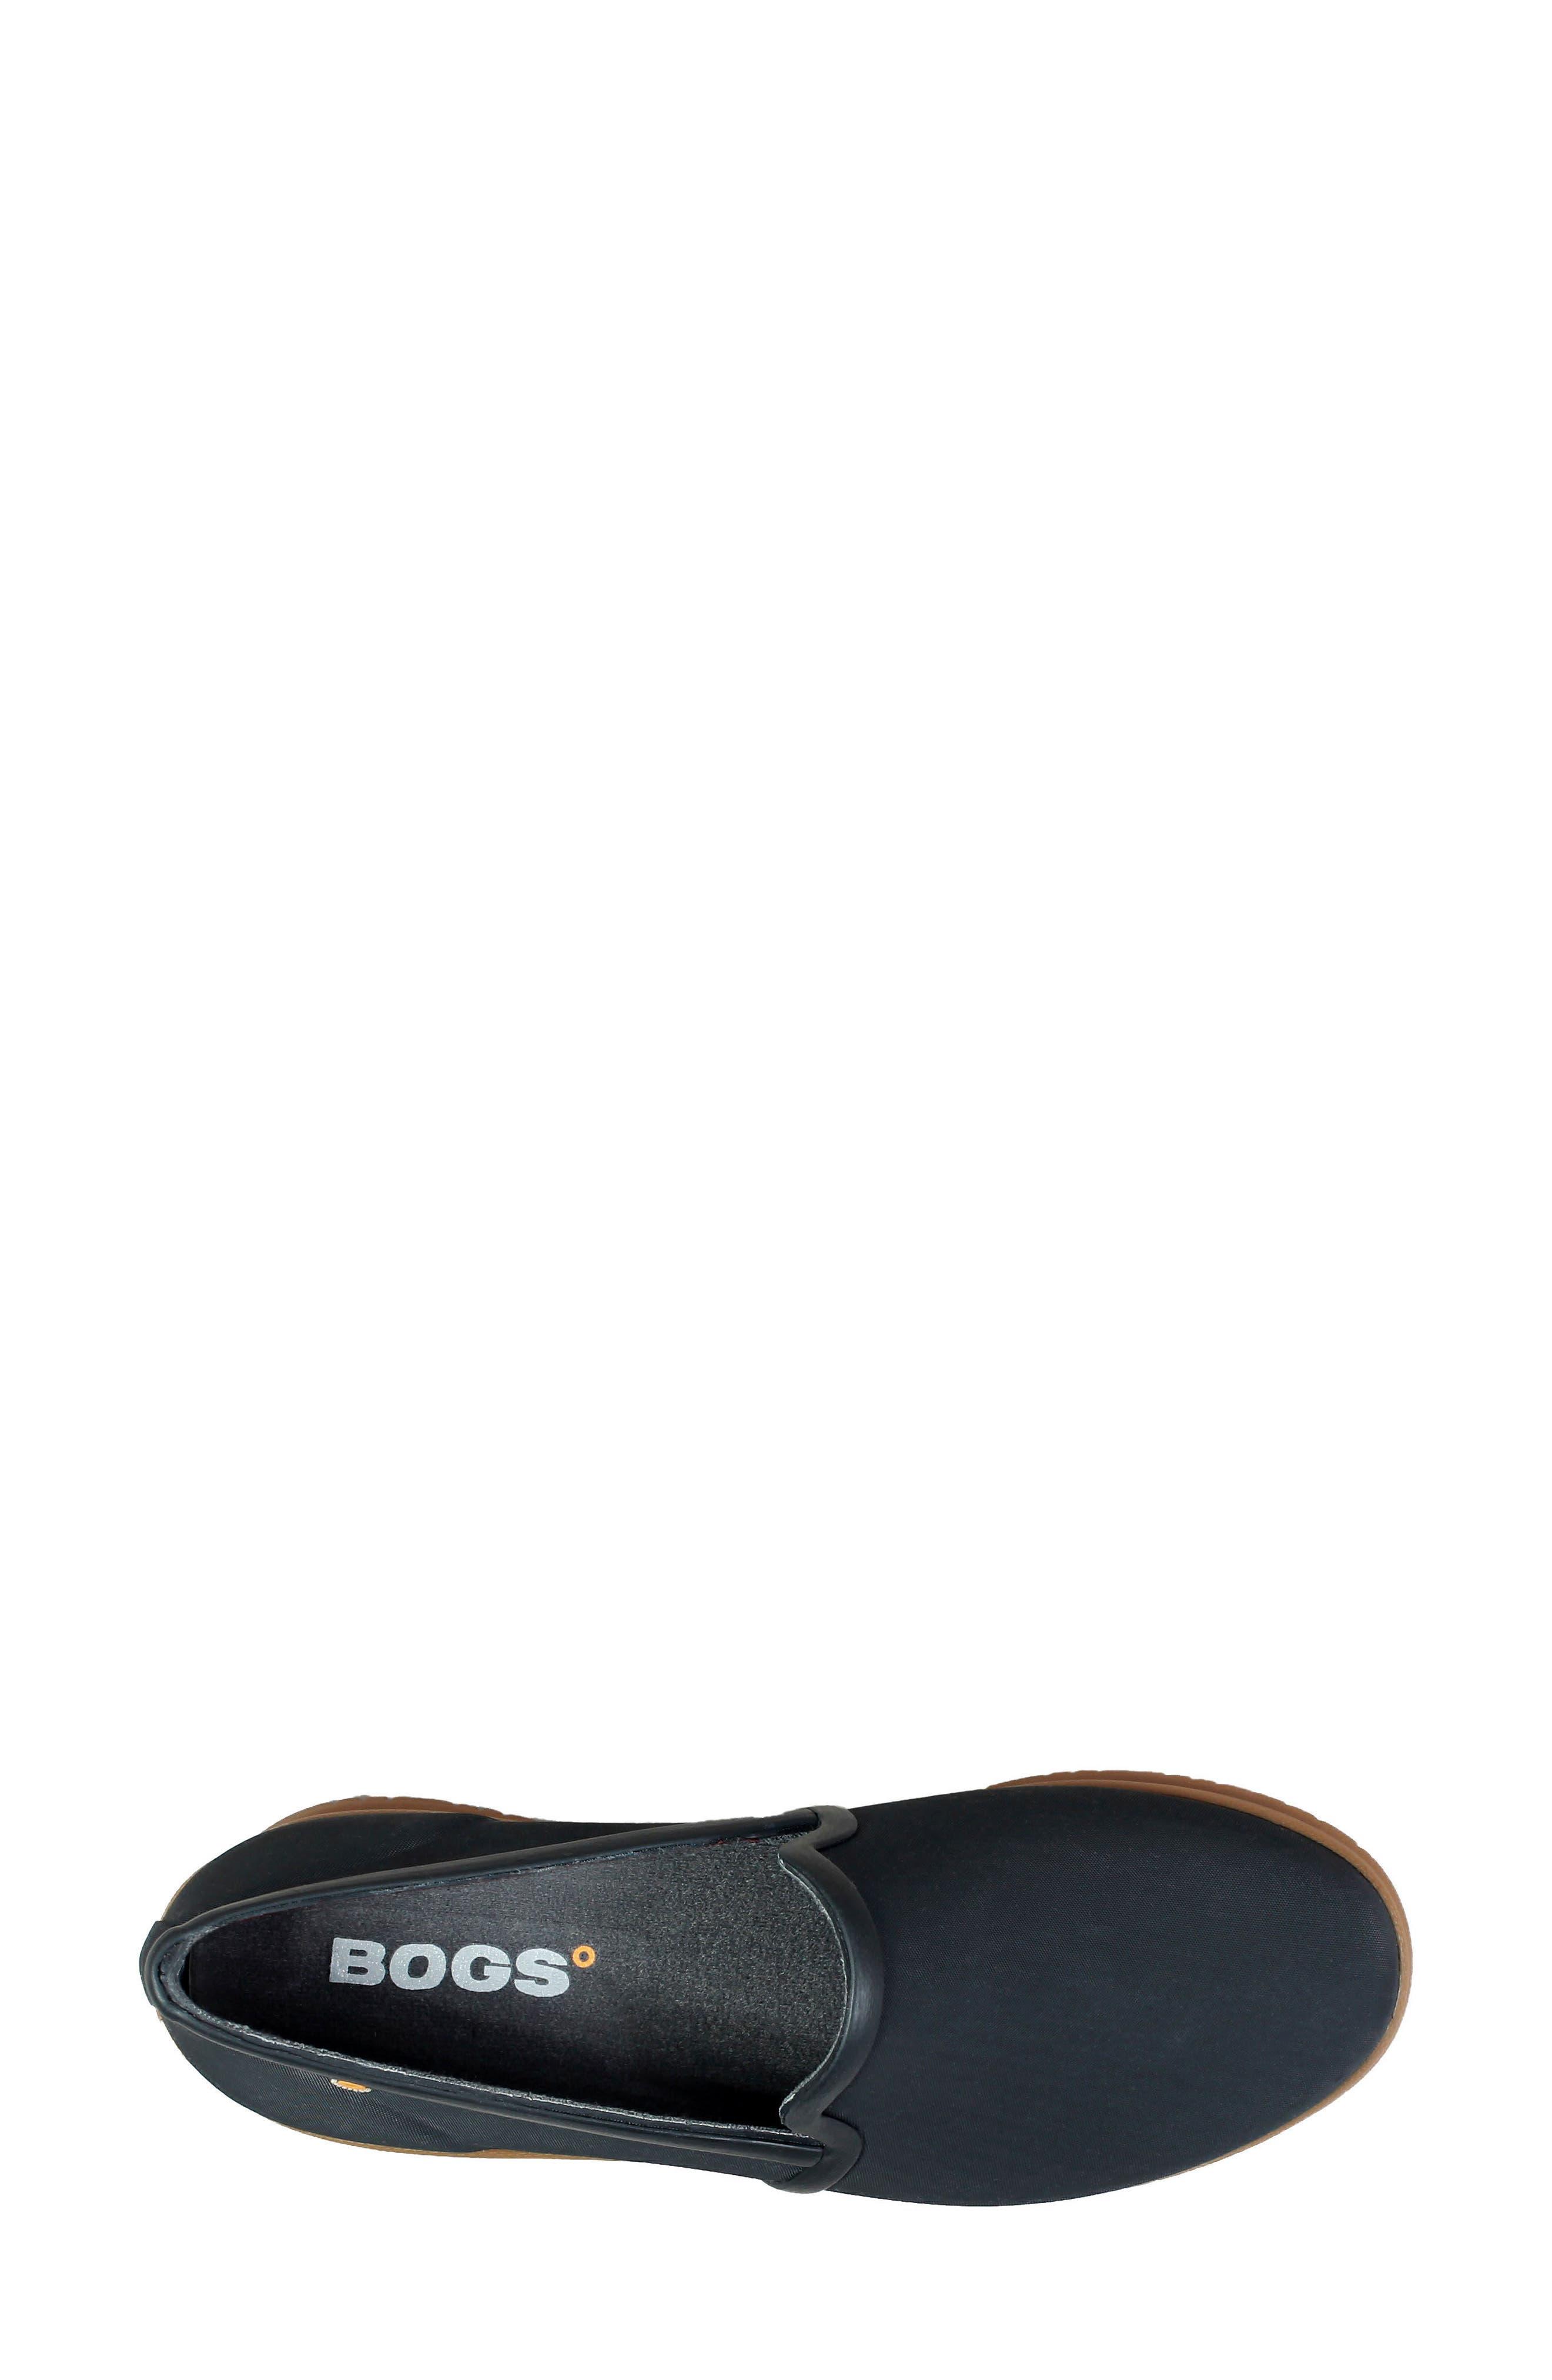 BOGS, Sweetpea Waterproof Slip-On Sneaker, Alternate thumbnail 5, color, 001